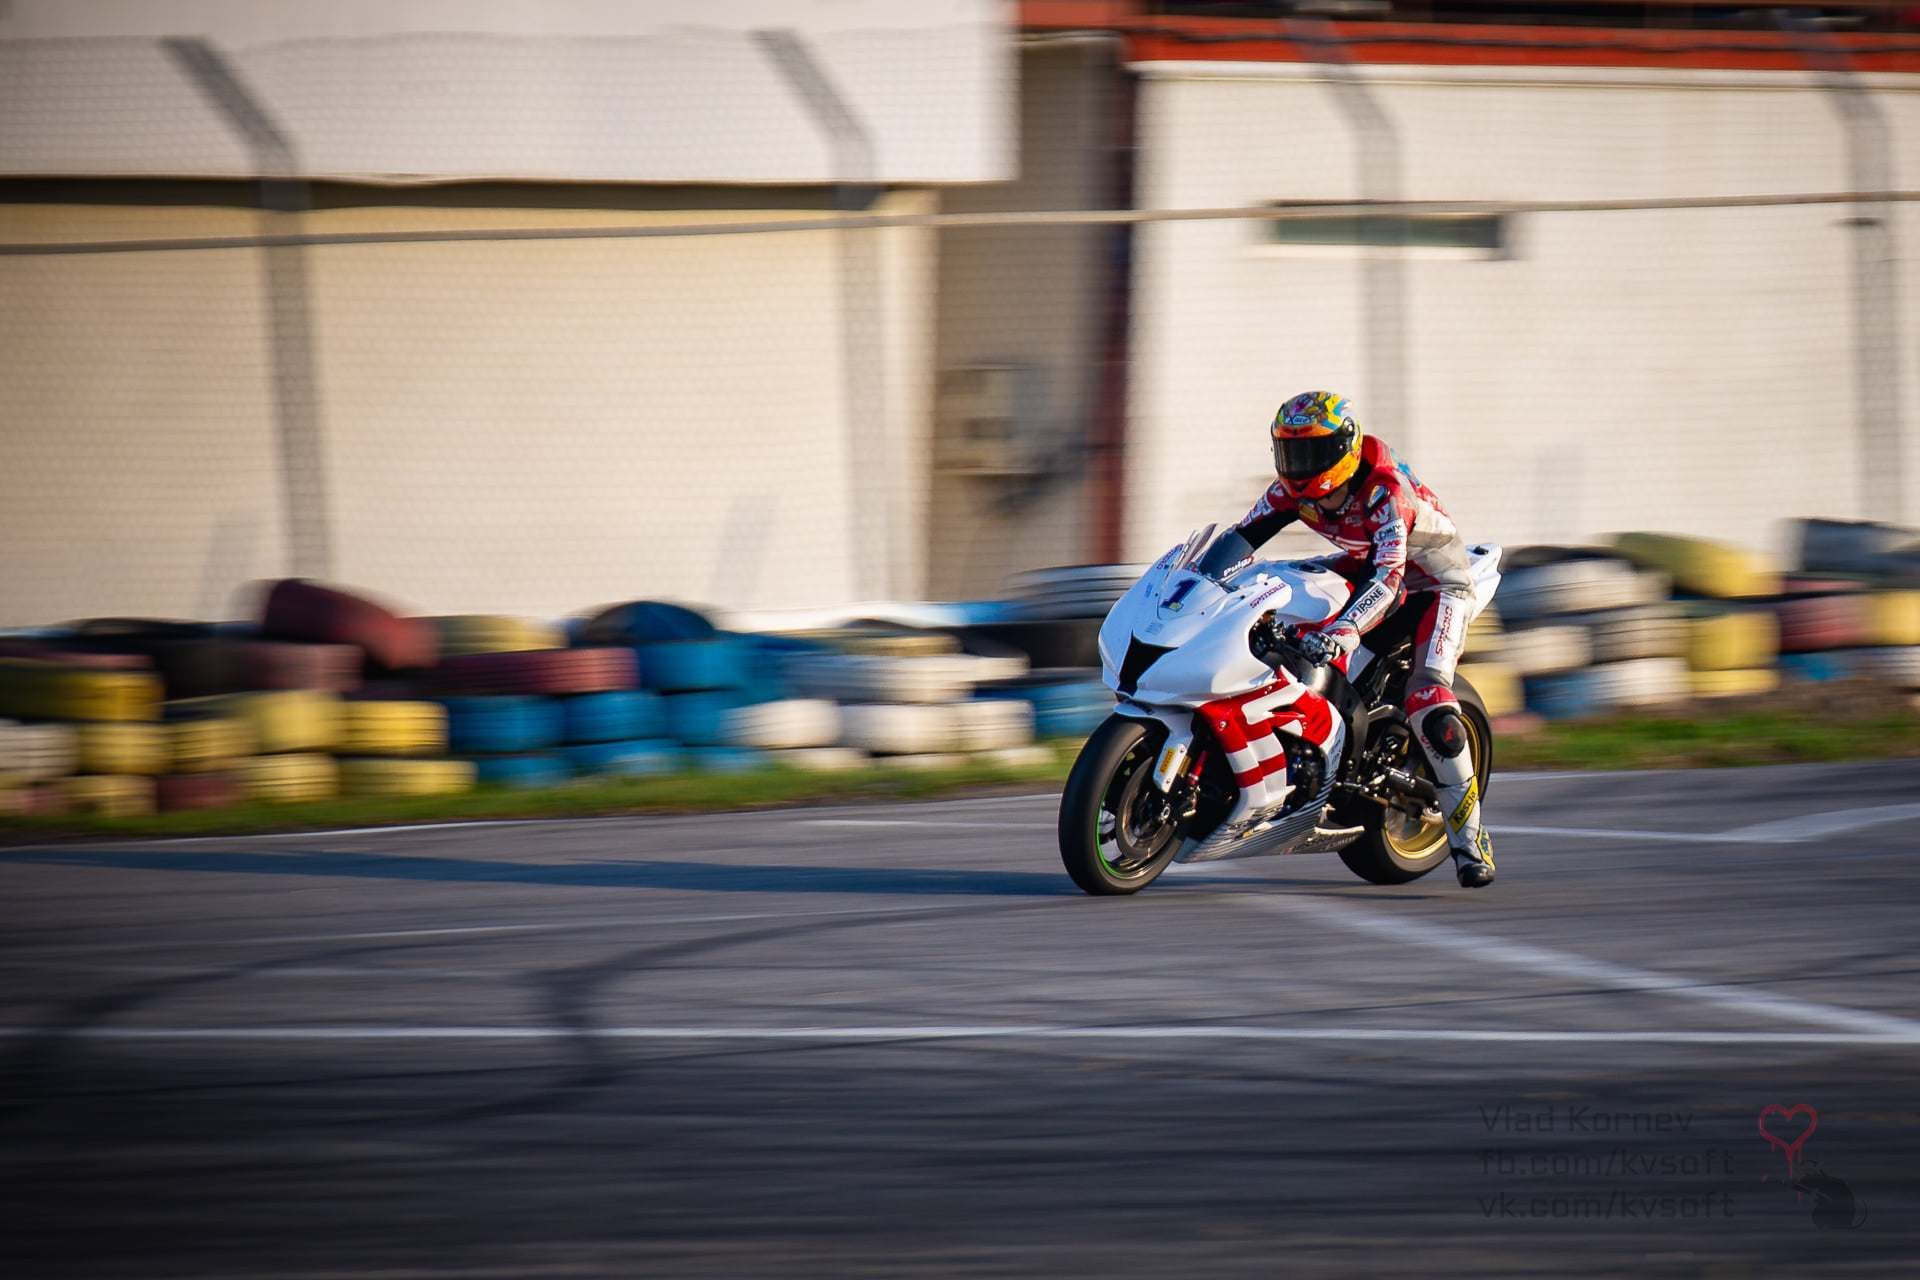 5-6_etap_MotoGPUkraine_026